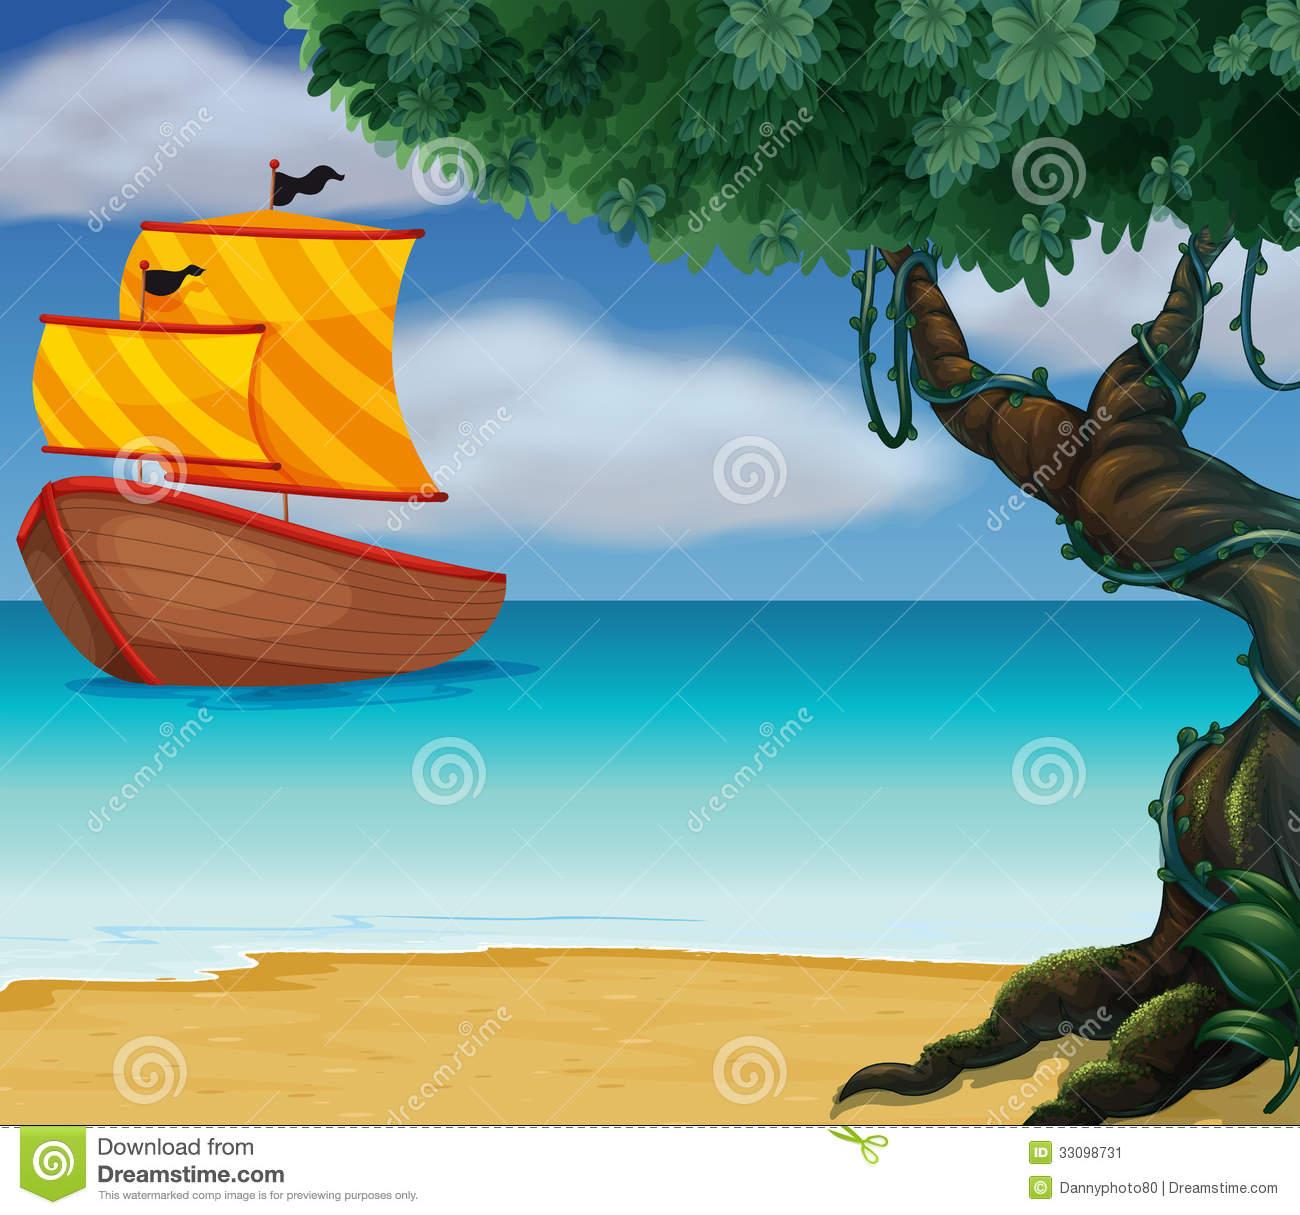 A Wooden Boat Near The Shoreline Stock Image.